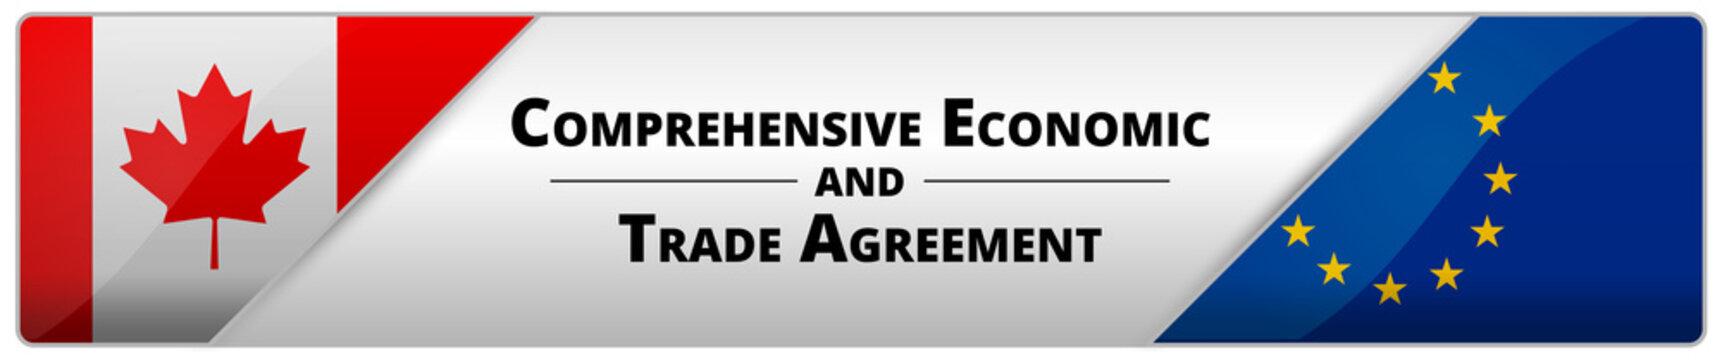 CETA - comprehensive economic and trade agreement between Canada